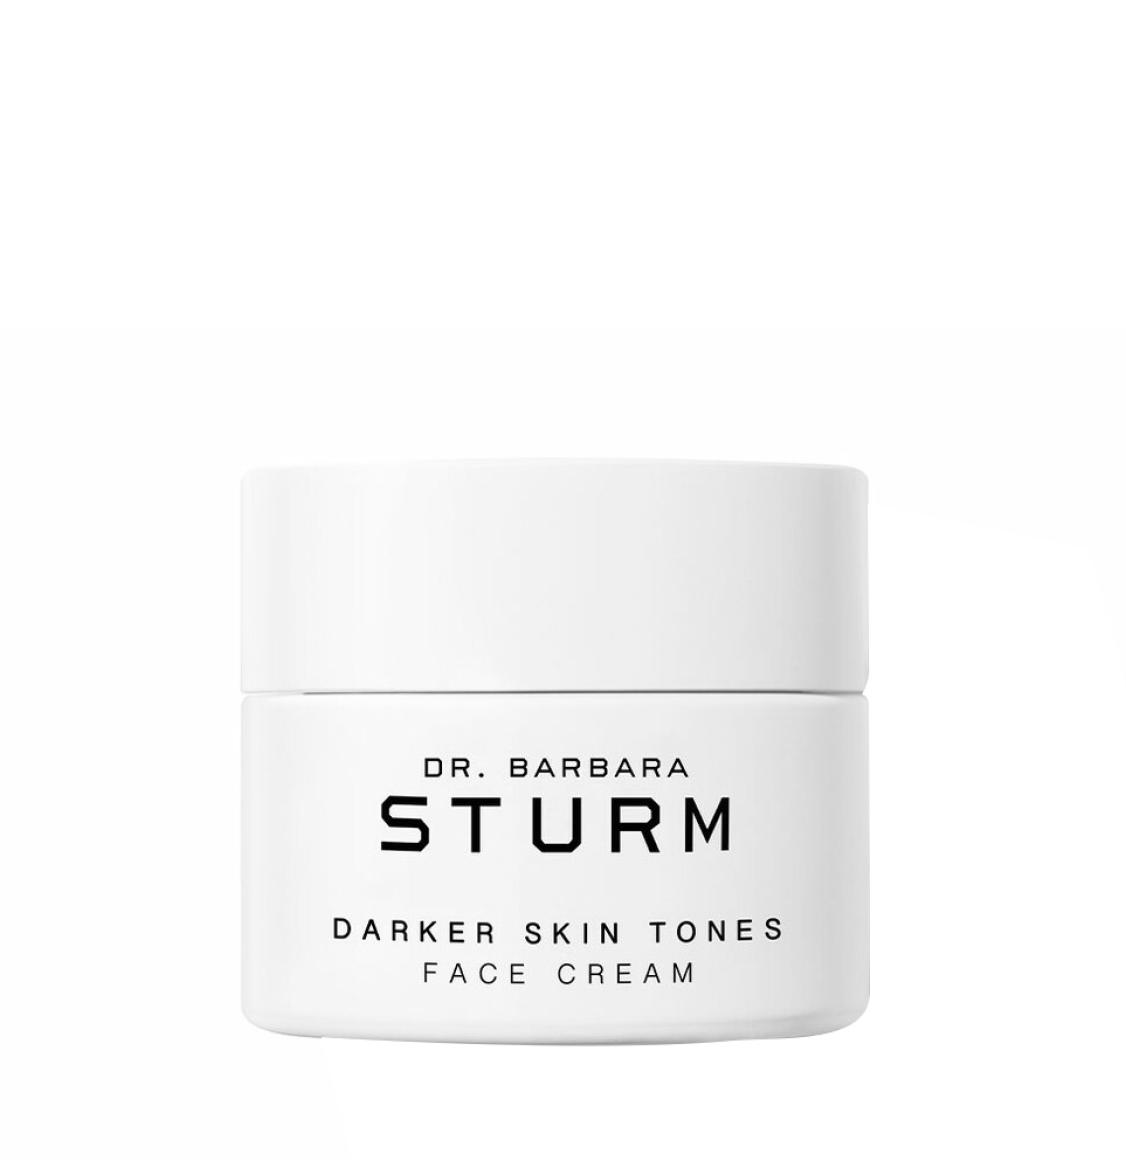 Dr. Barbara Sturm Darker Skin Tones Face Cream 50ml